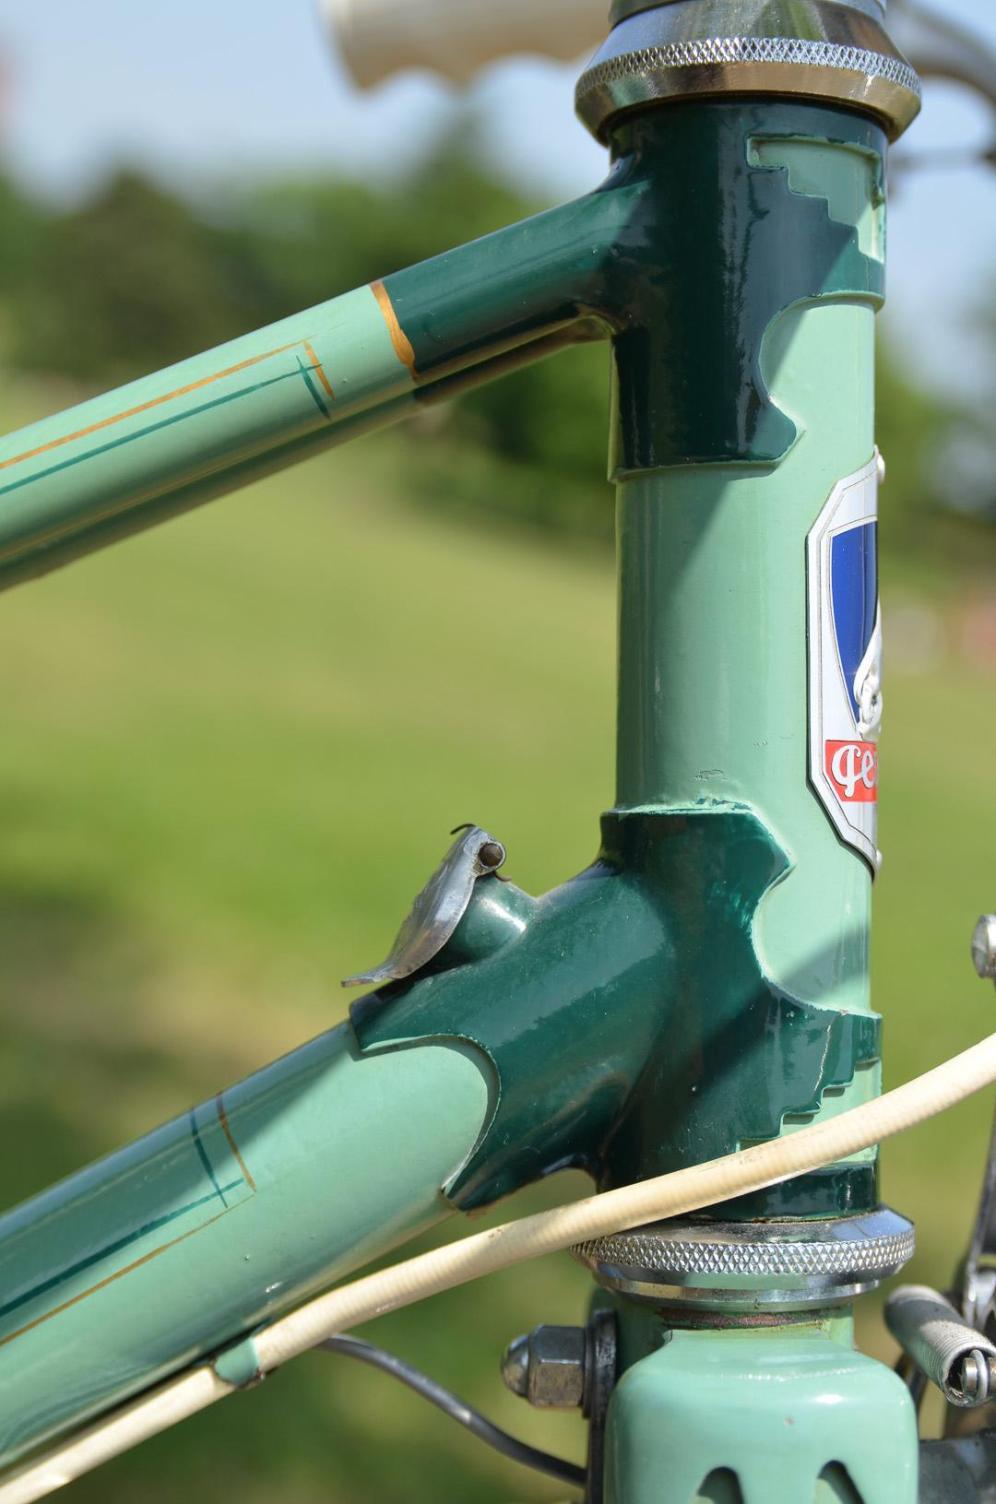 1950's Vintage Peugeot Bicycle Antivol lock